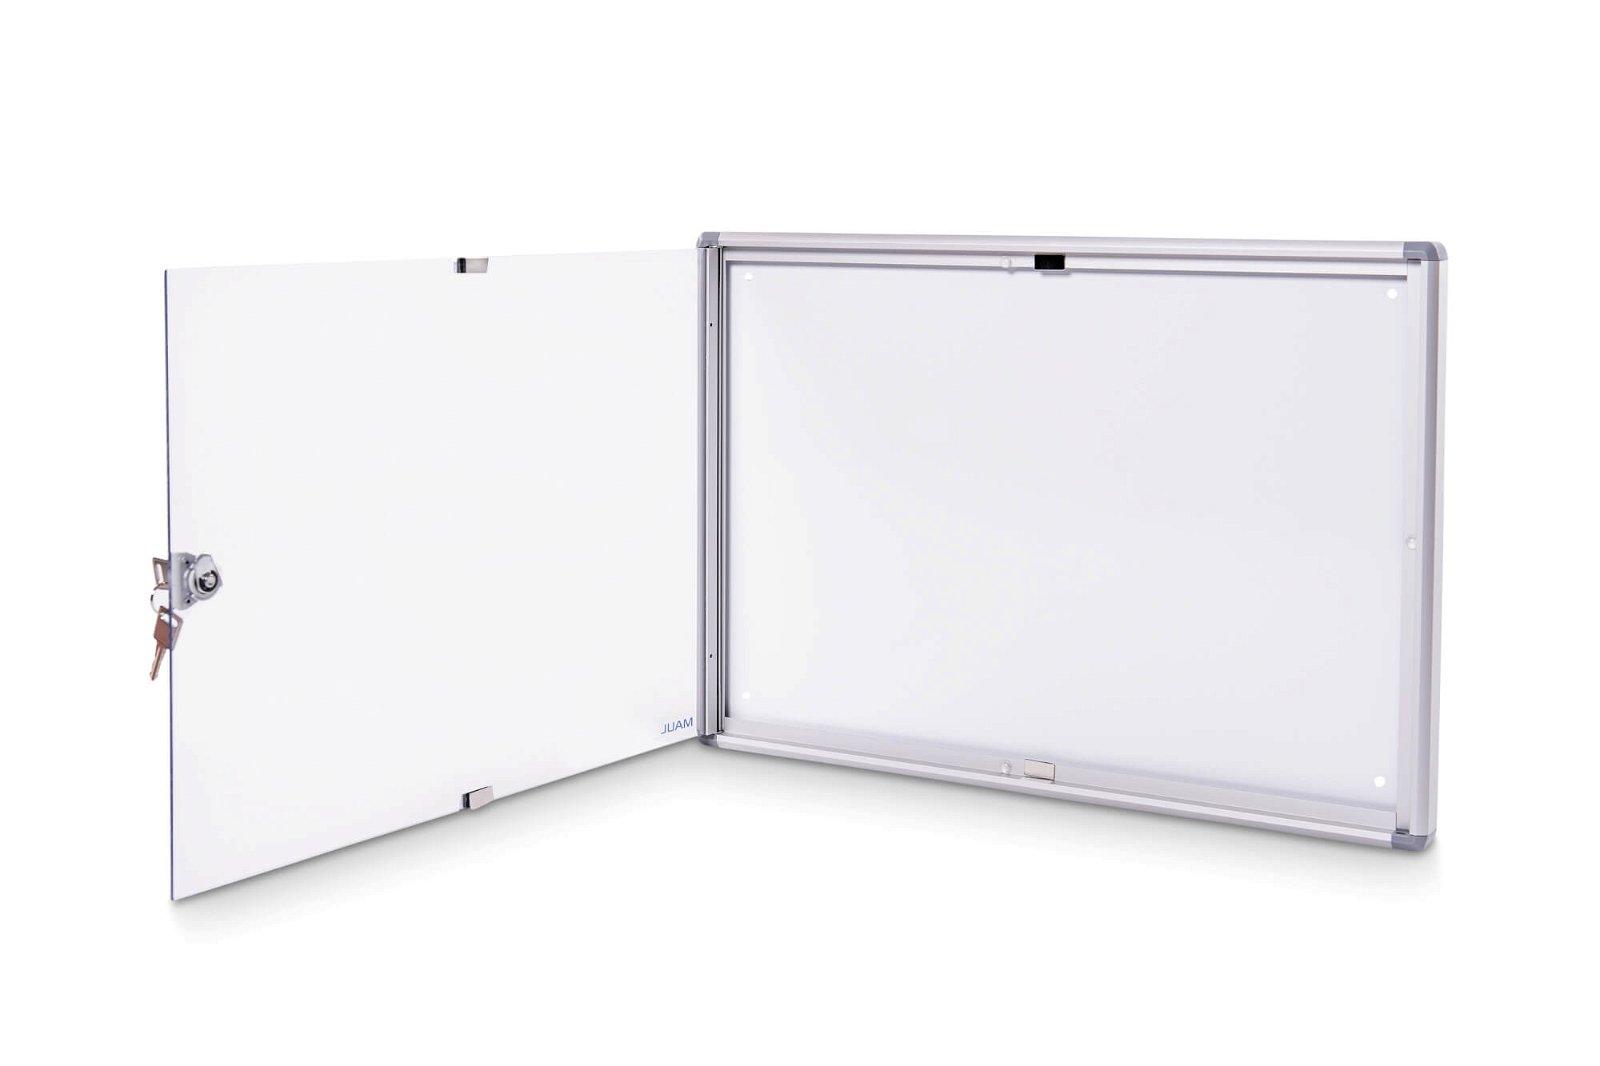 Schaukasten MAULextraslim, 2 x A4, aluminium